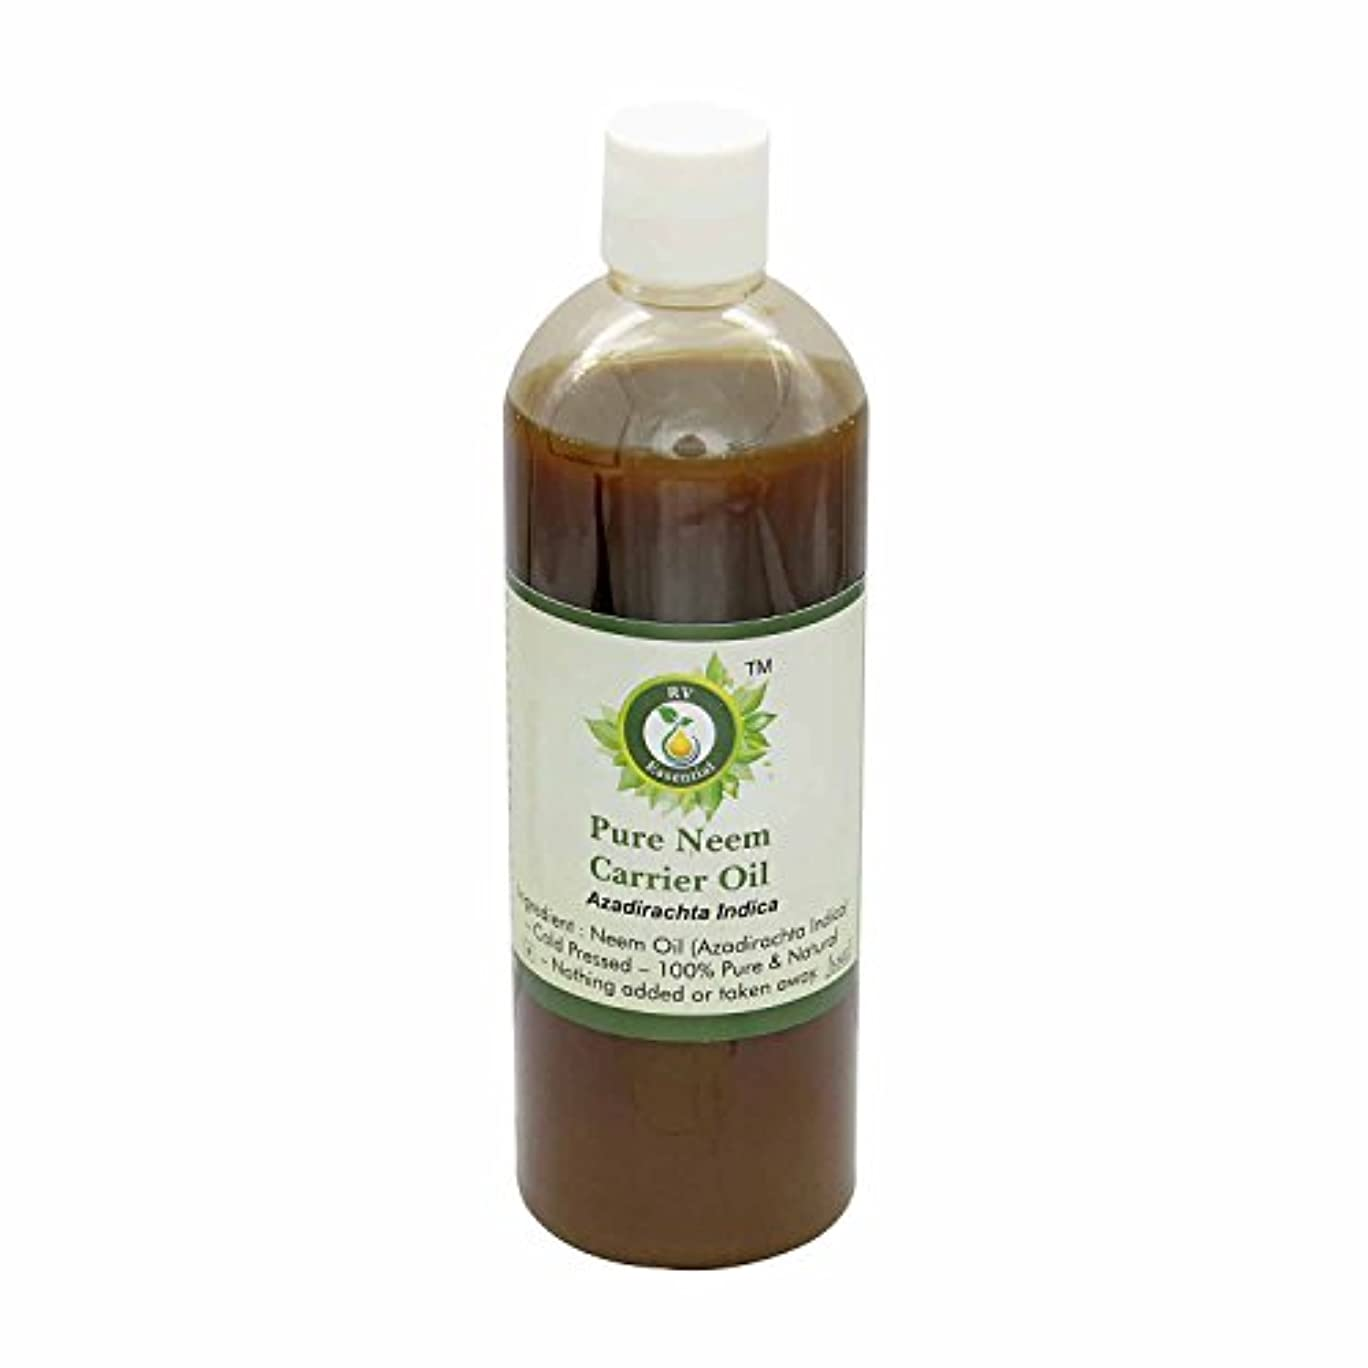 R V Essential 純Neemキャリアオイル100ml (3.38oz)- Azadirachta Indica (100%ピュア&ナチュラルコールドPressed) Pure Neem Carrier Oil